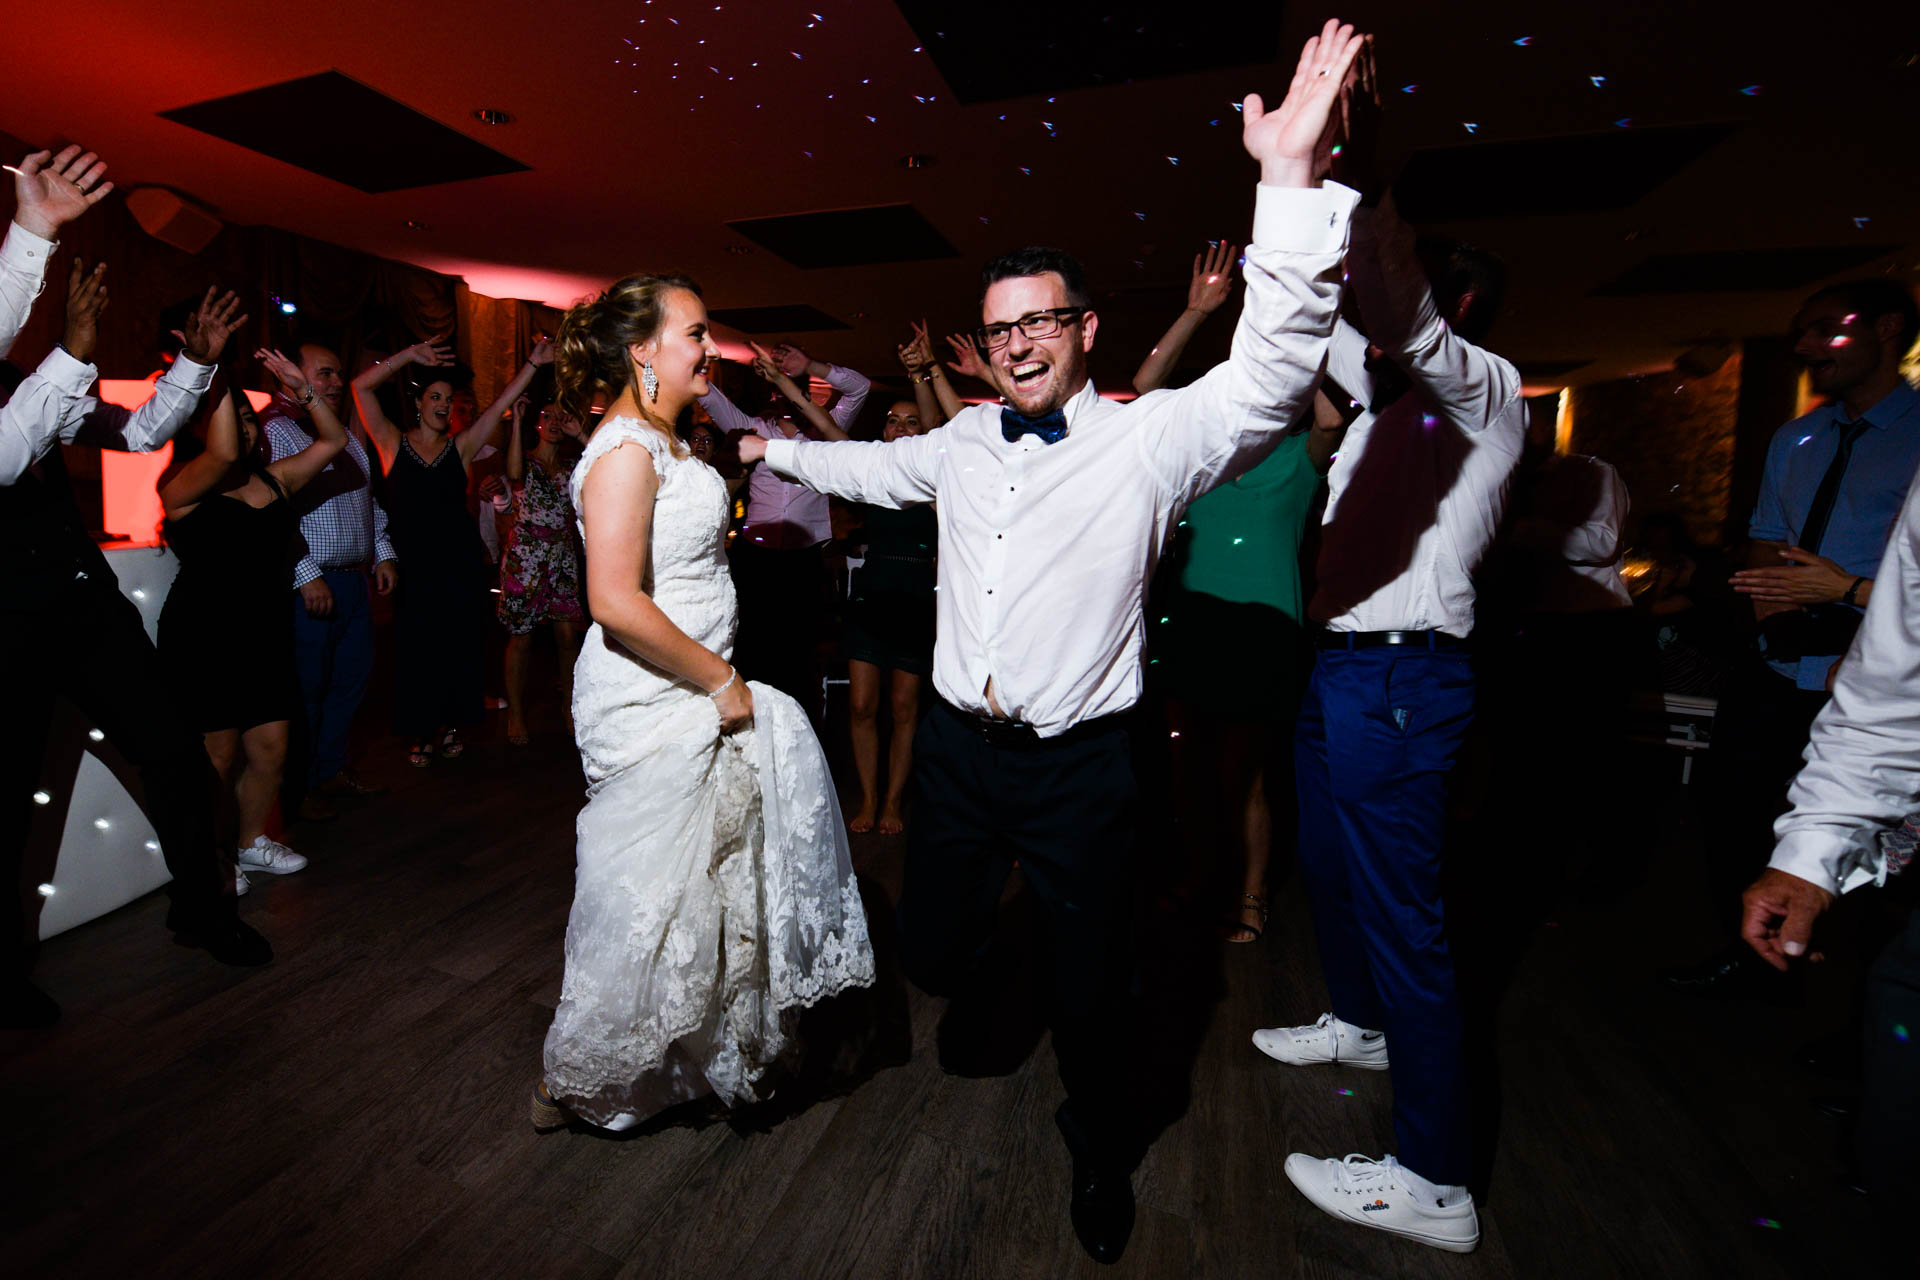 photographe de mariage haut de gamme Chambéry dance floor